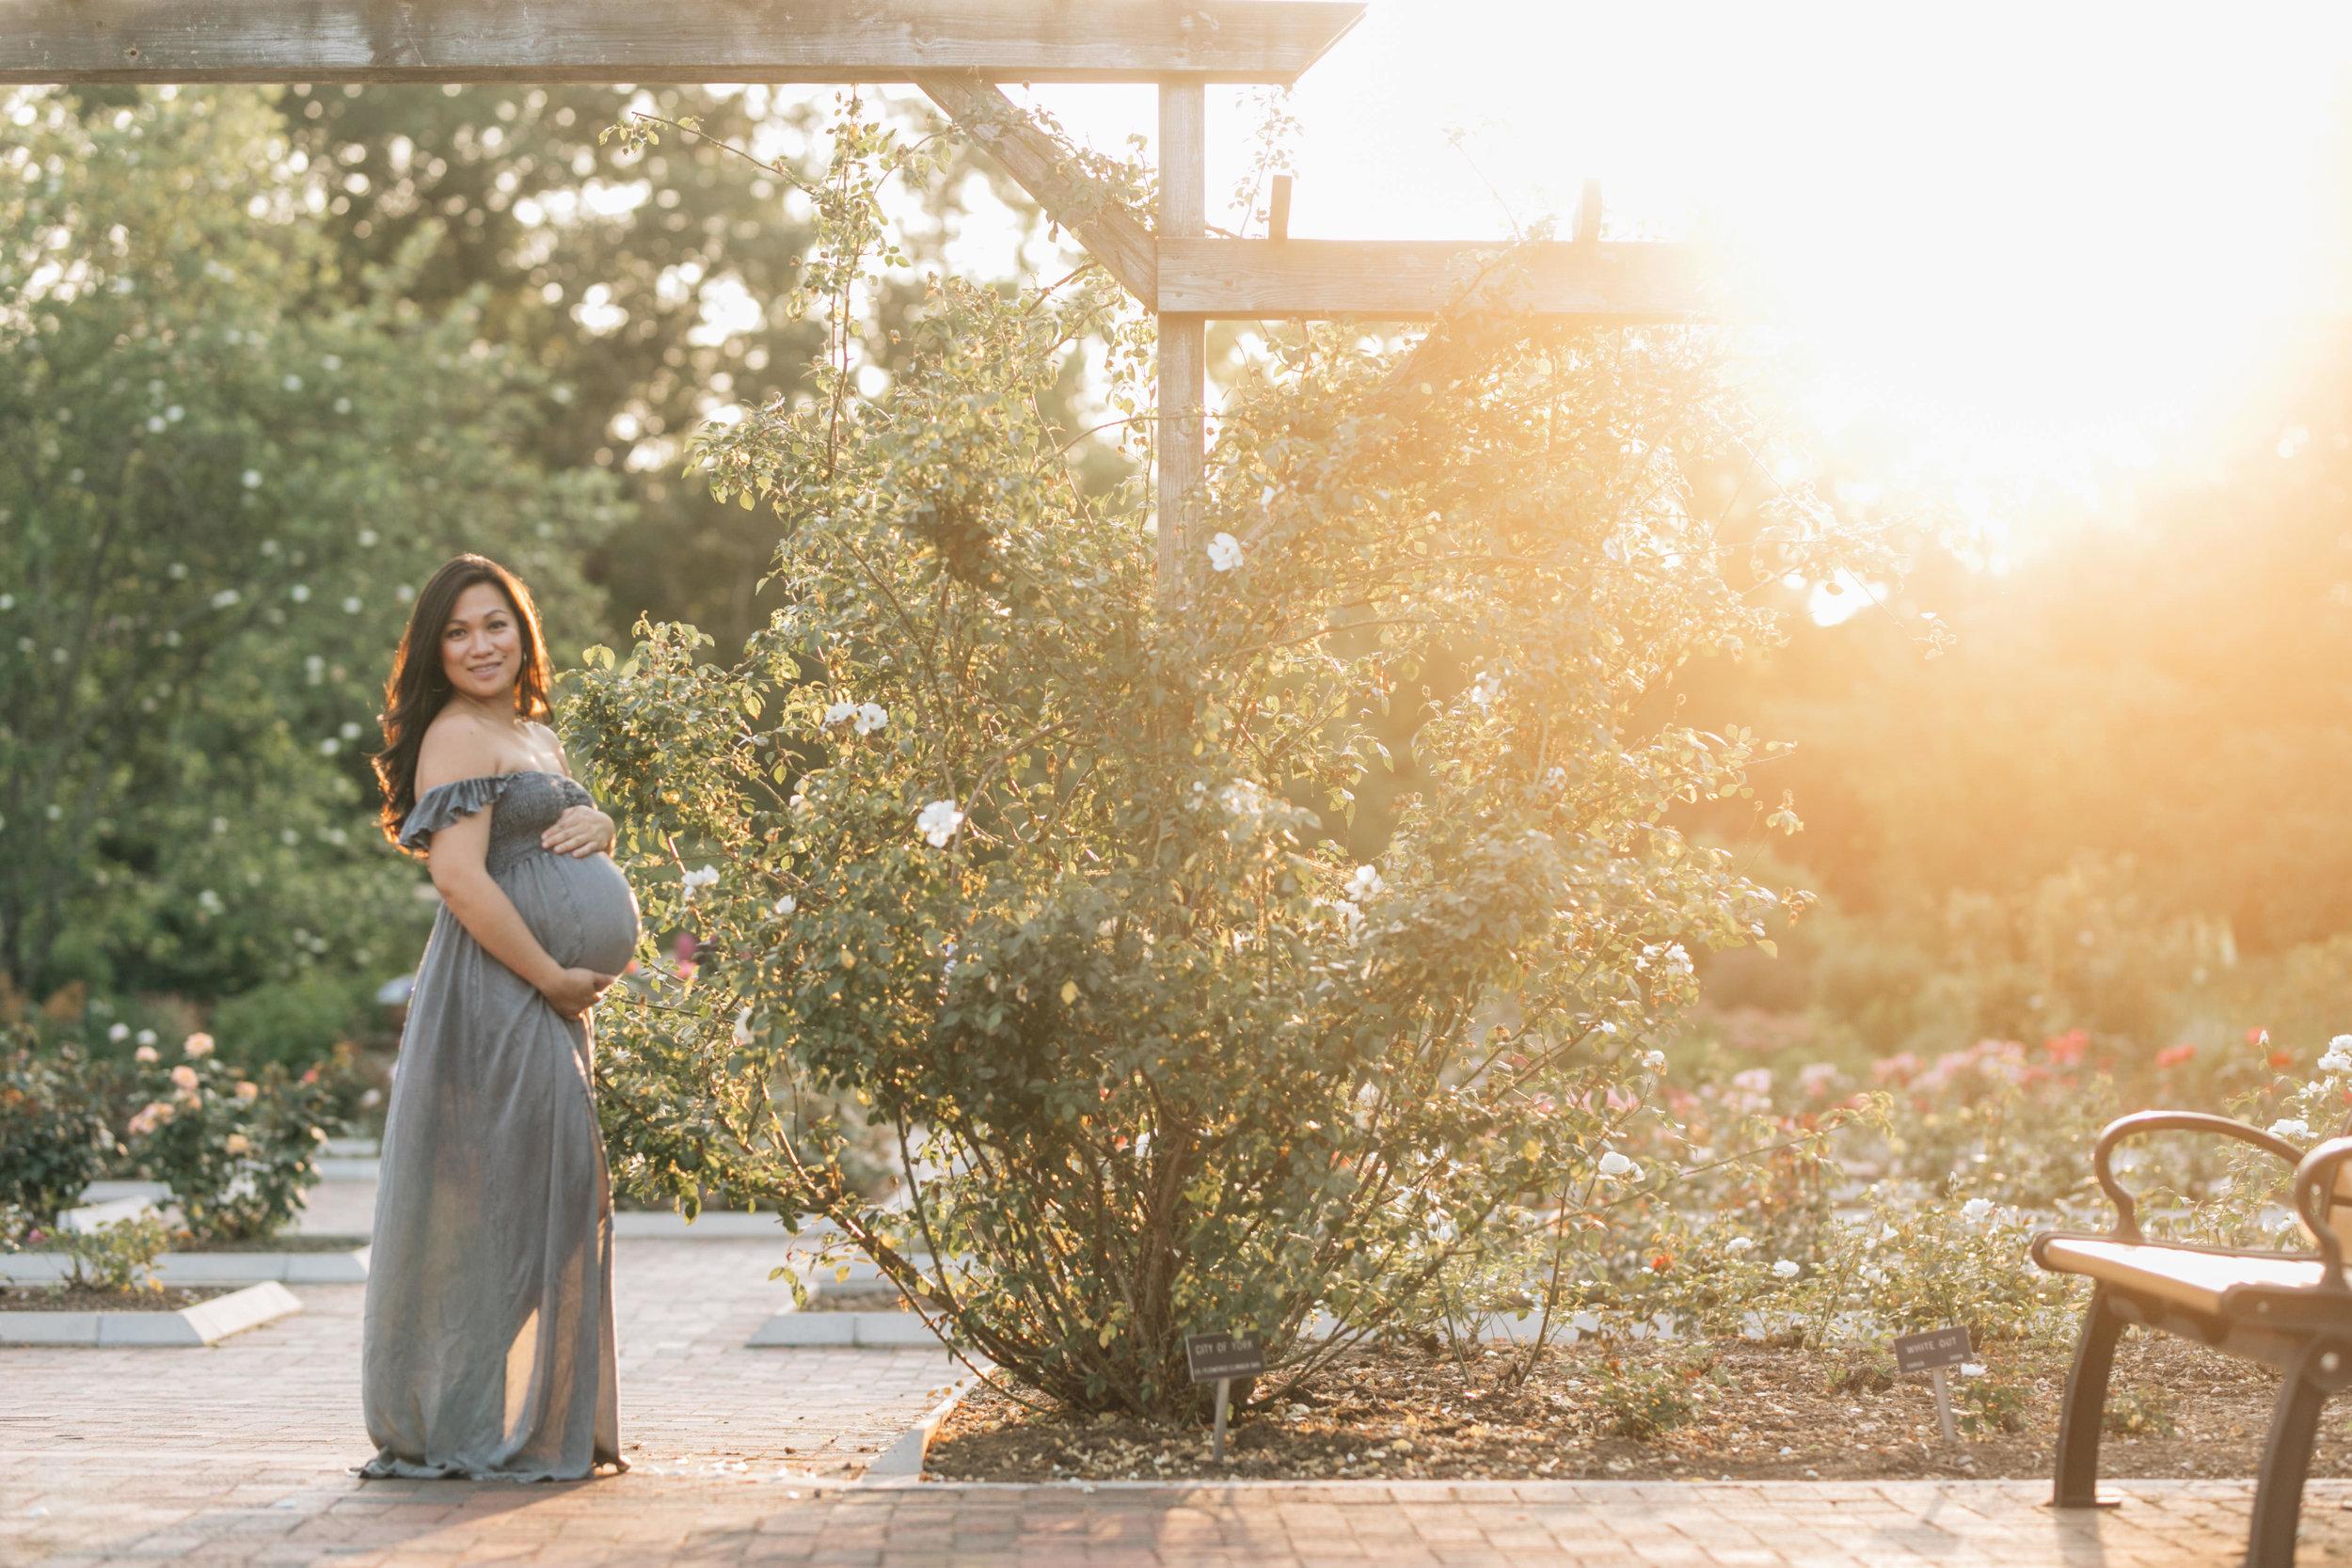 Kat_Maternity-30.jpg